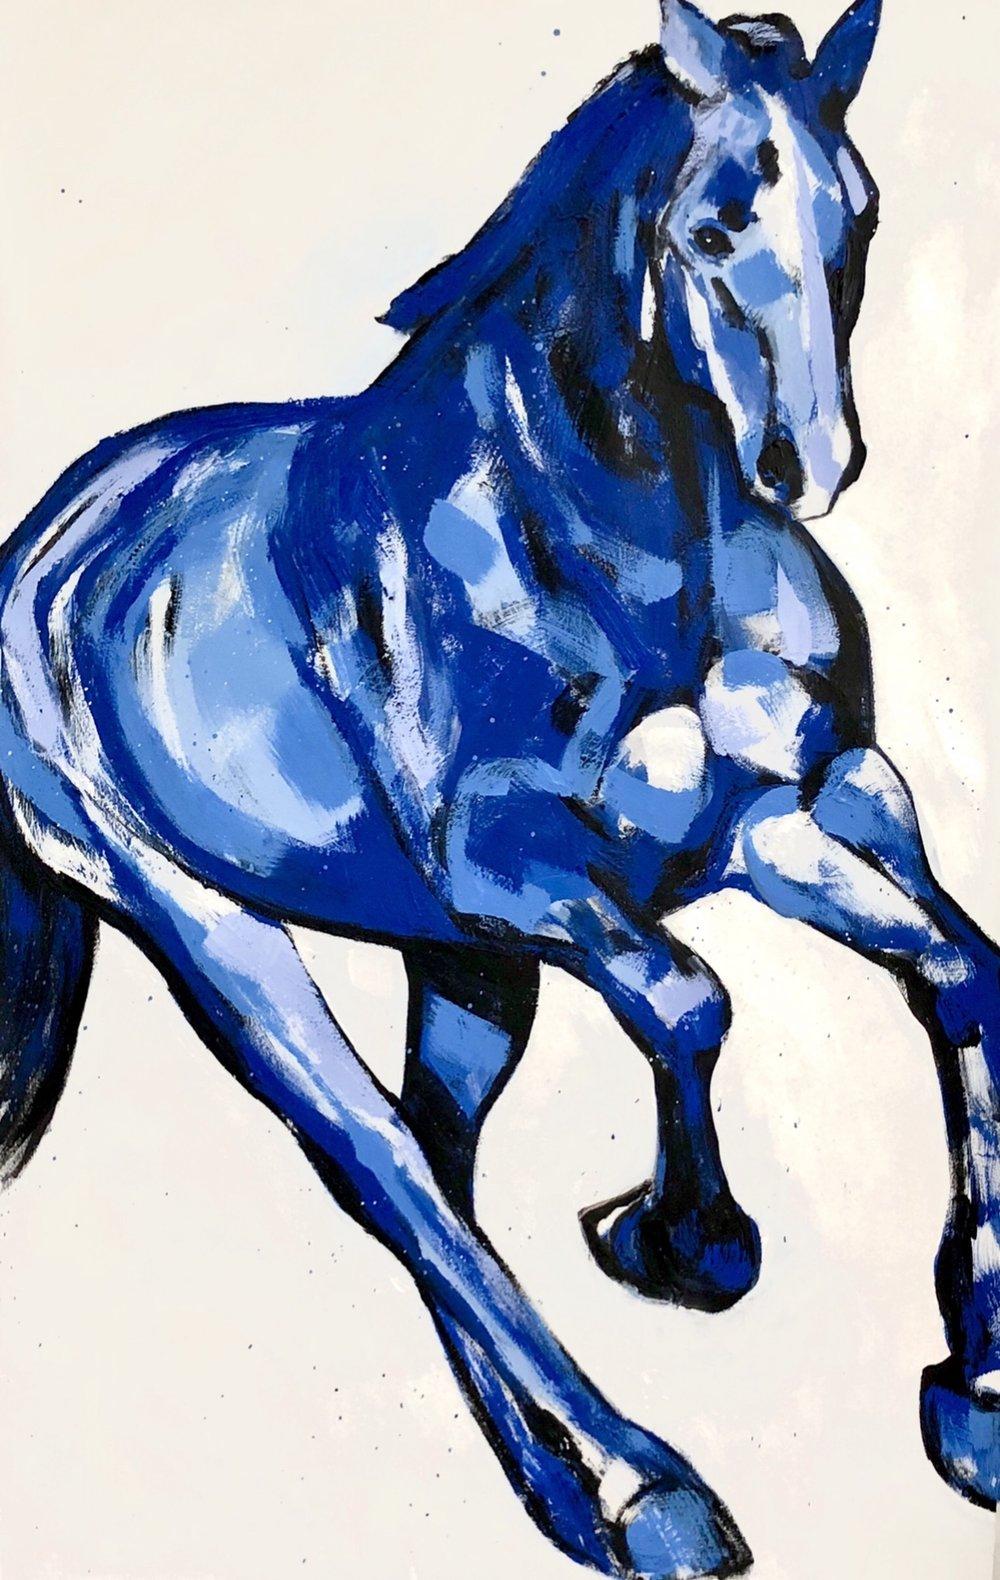 Blue Horse Series